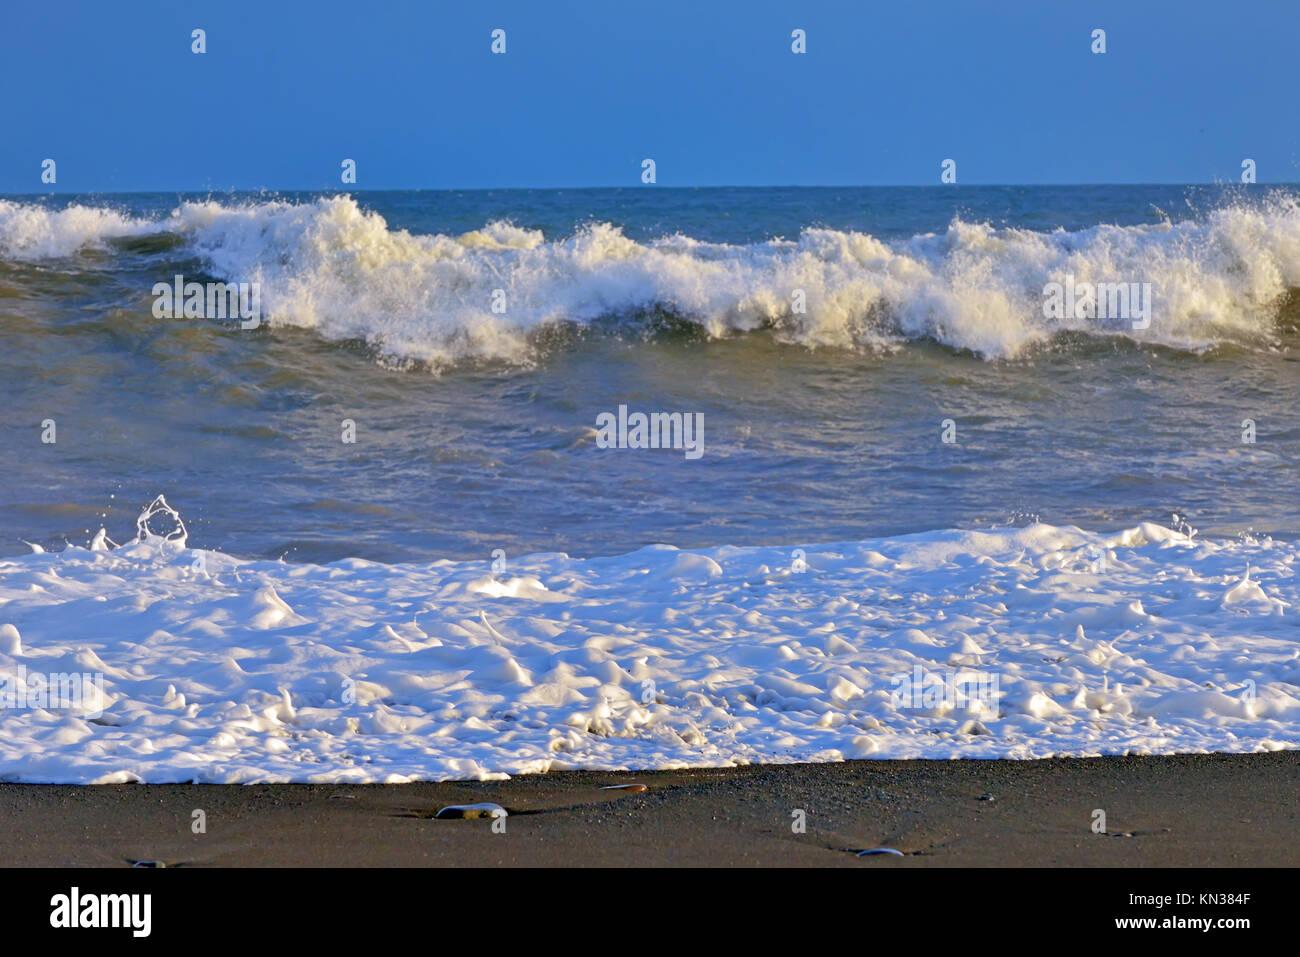 waves on atlantic ocean coast in iceland. - Stock Image